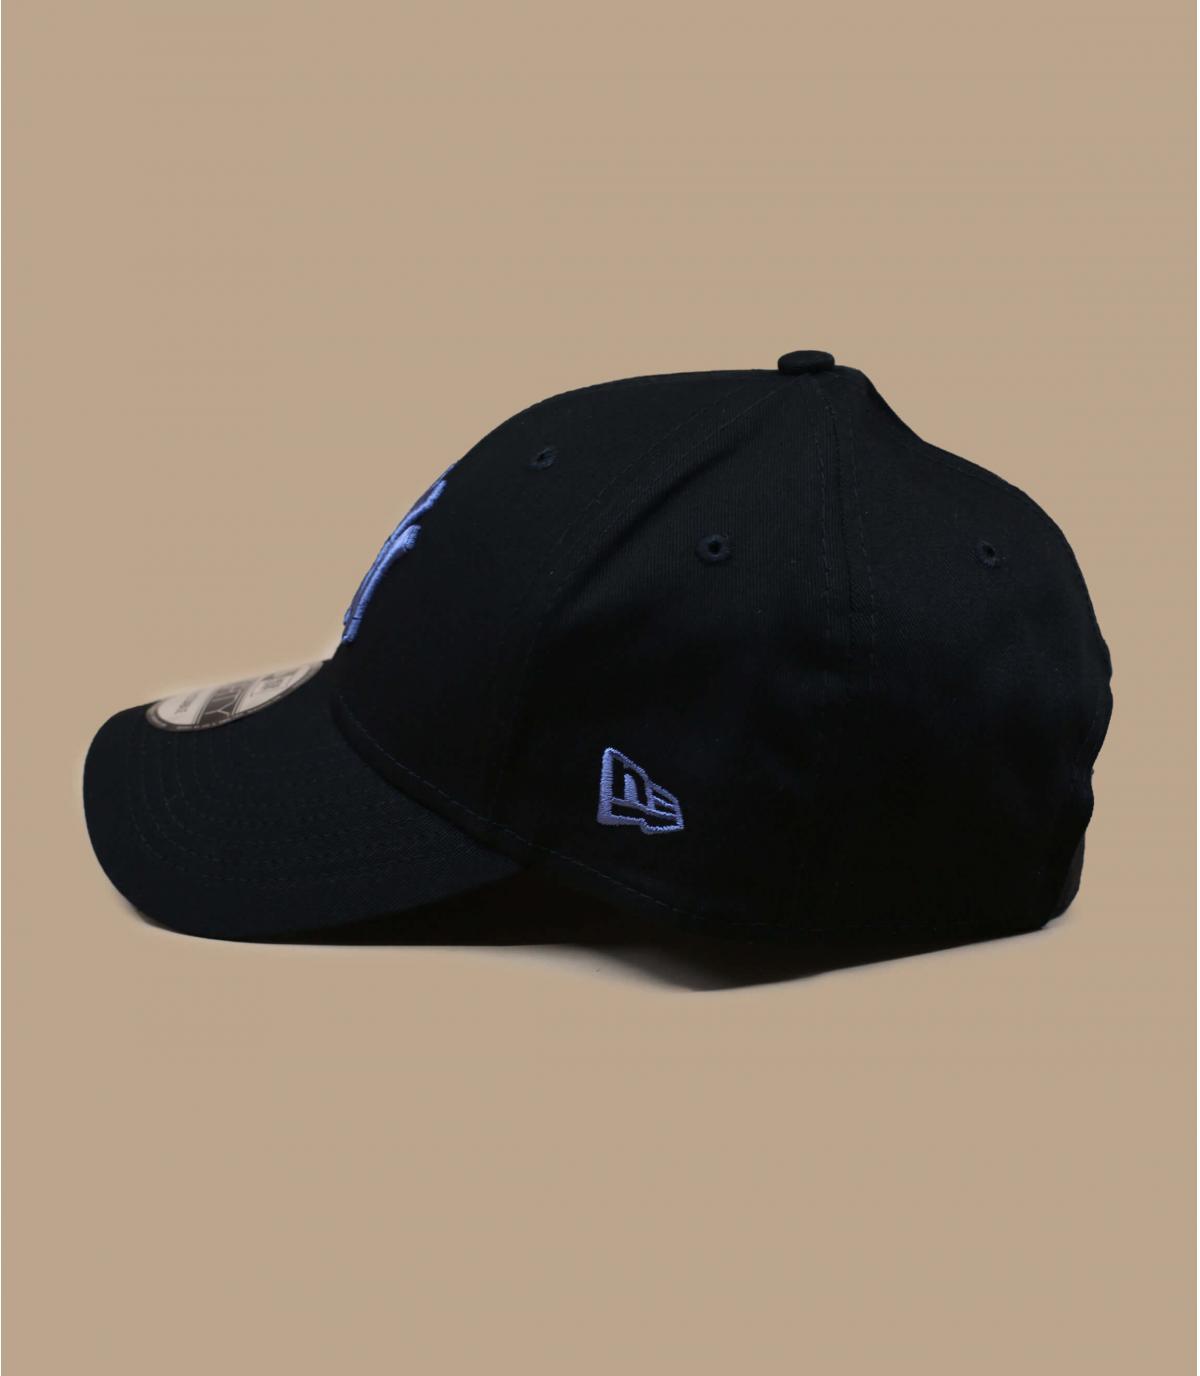 zwart blauwe NY cap